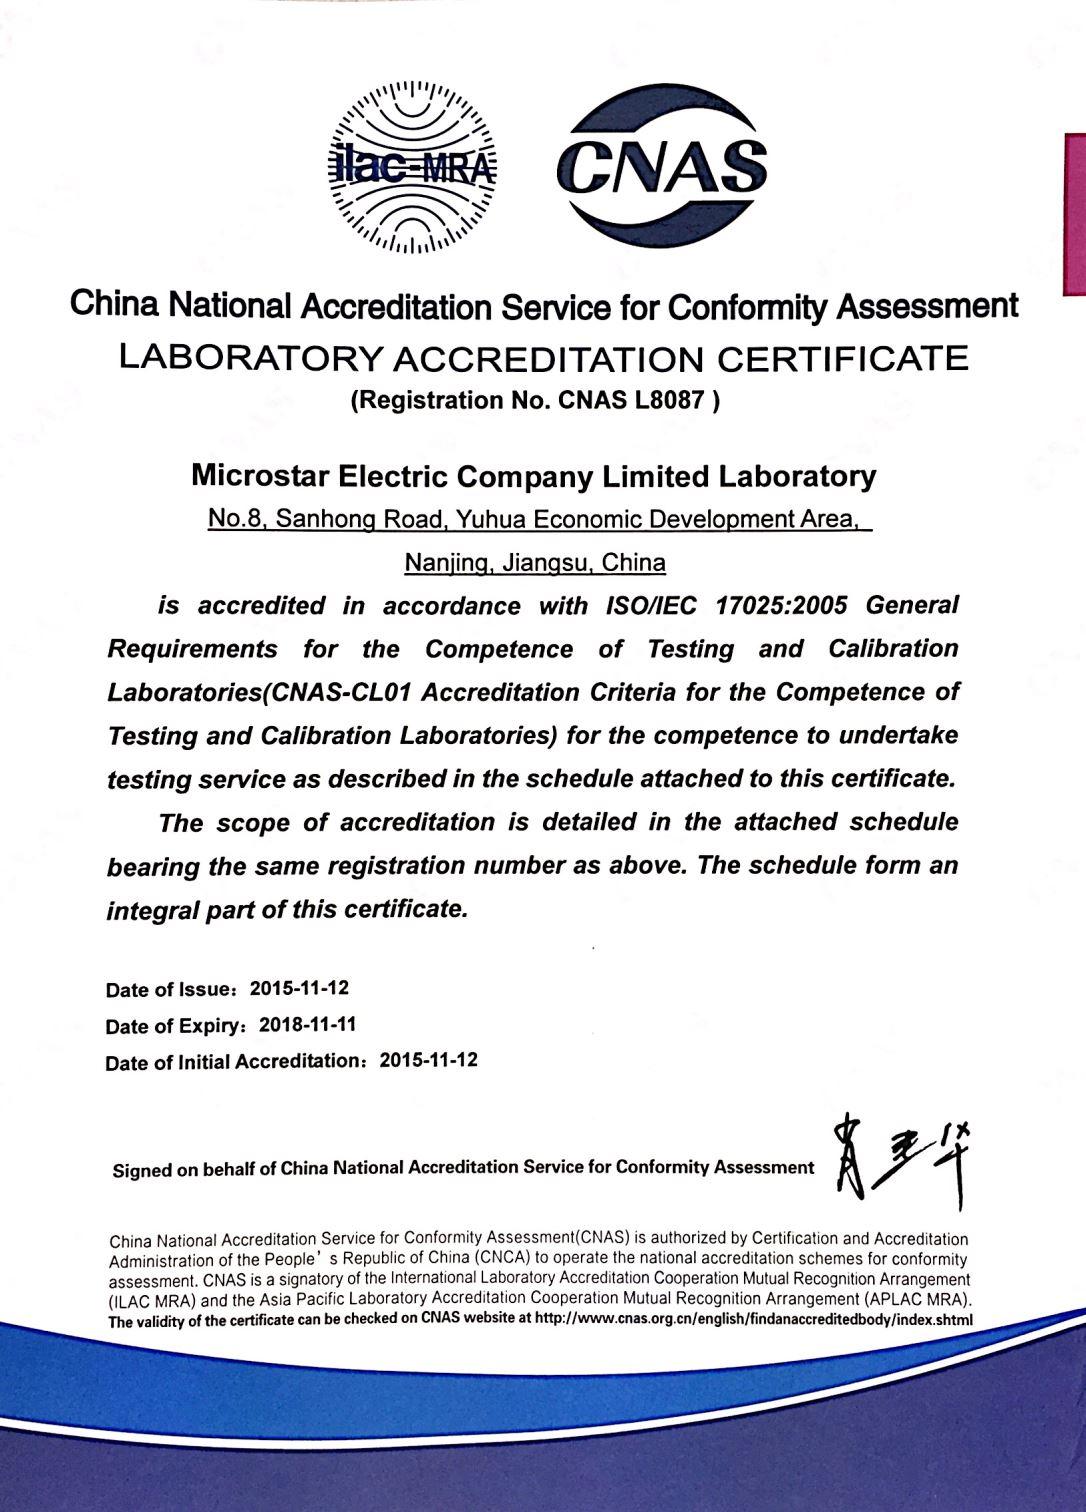 IEC17025 Lab Accreditation (CNAS) Certificate